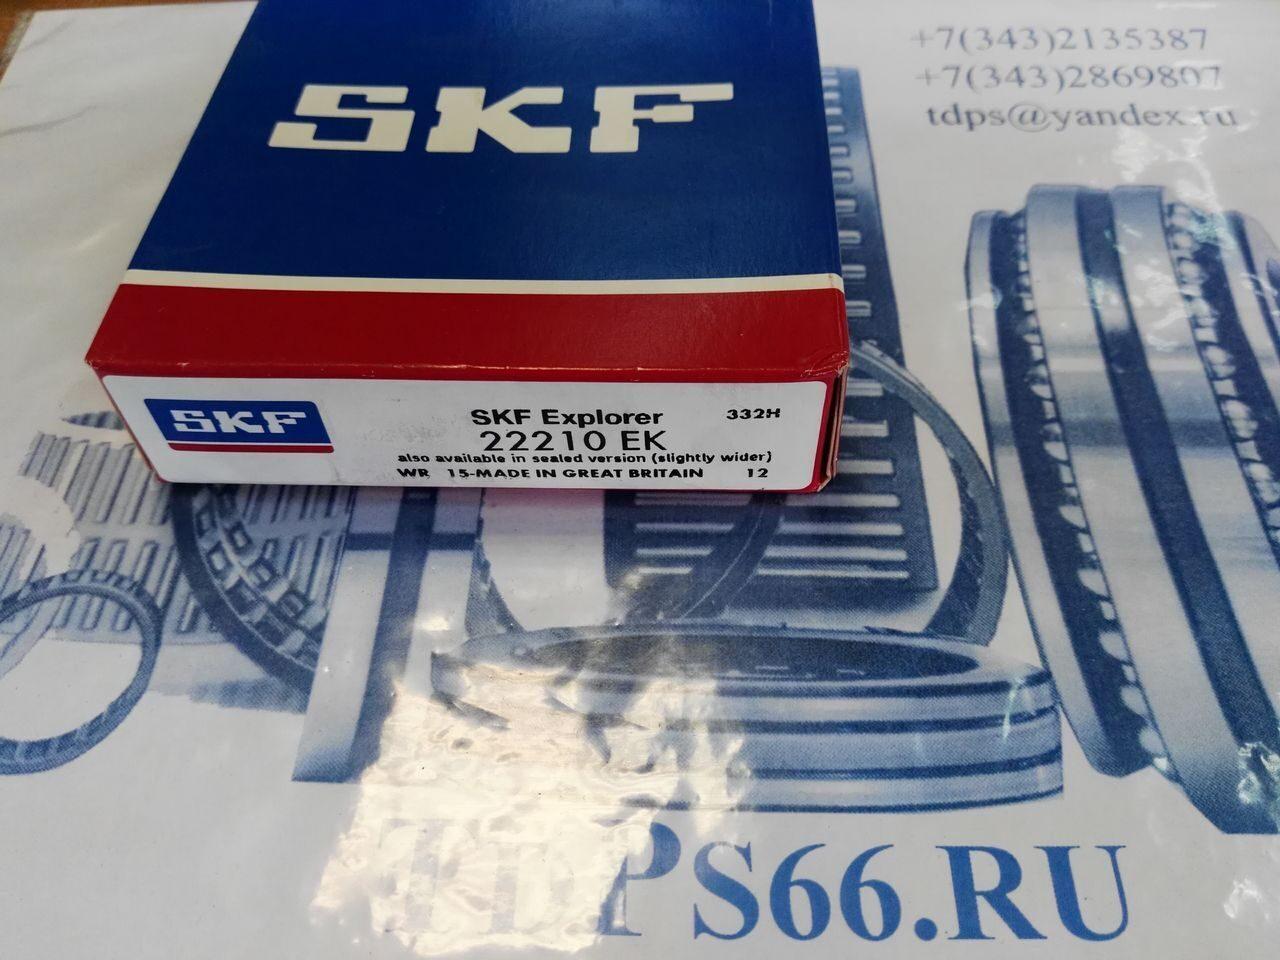 Skf ru обратной связи